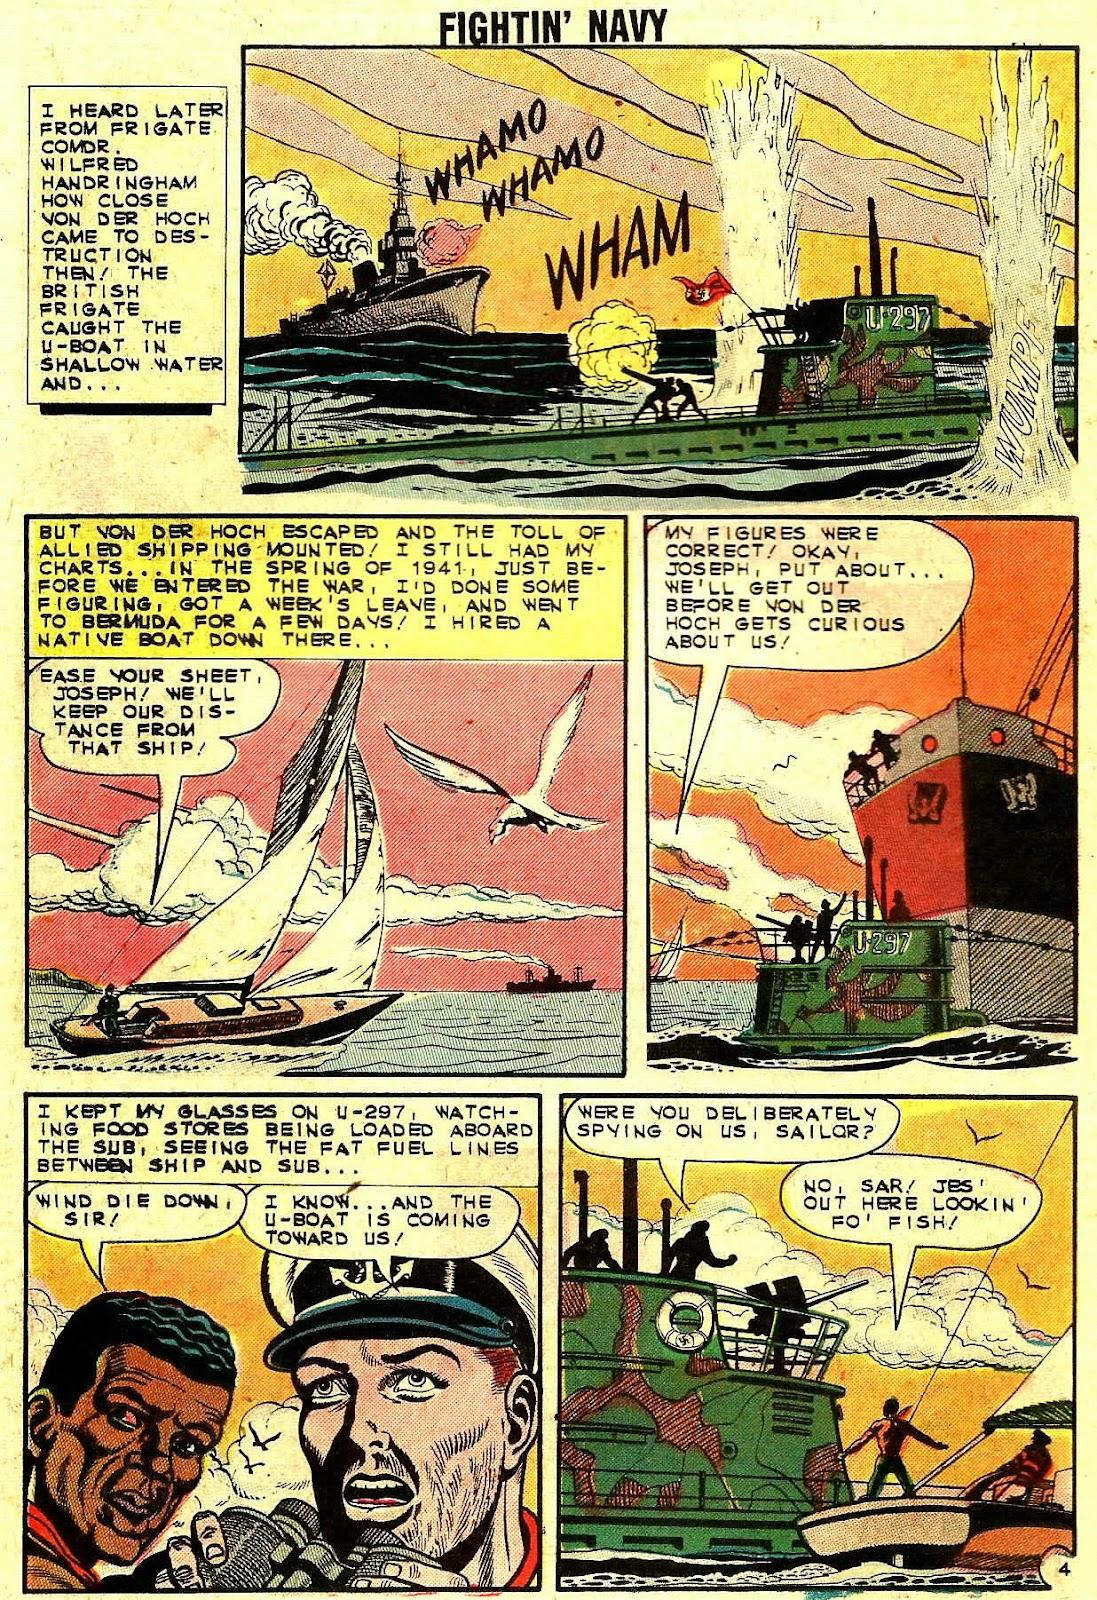 Read online Fightin' Navy comic -  Issue #109 - 26